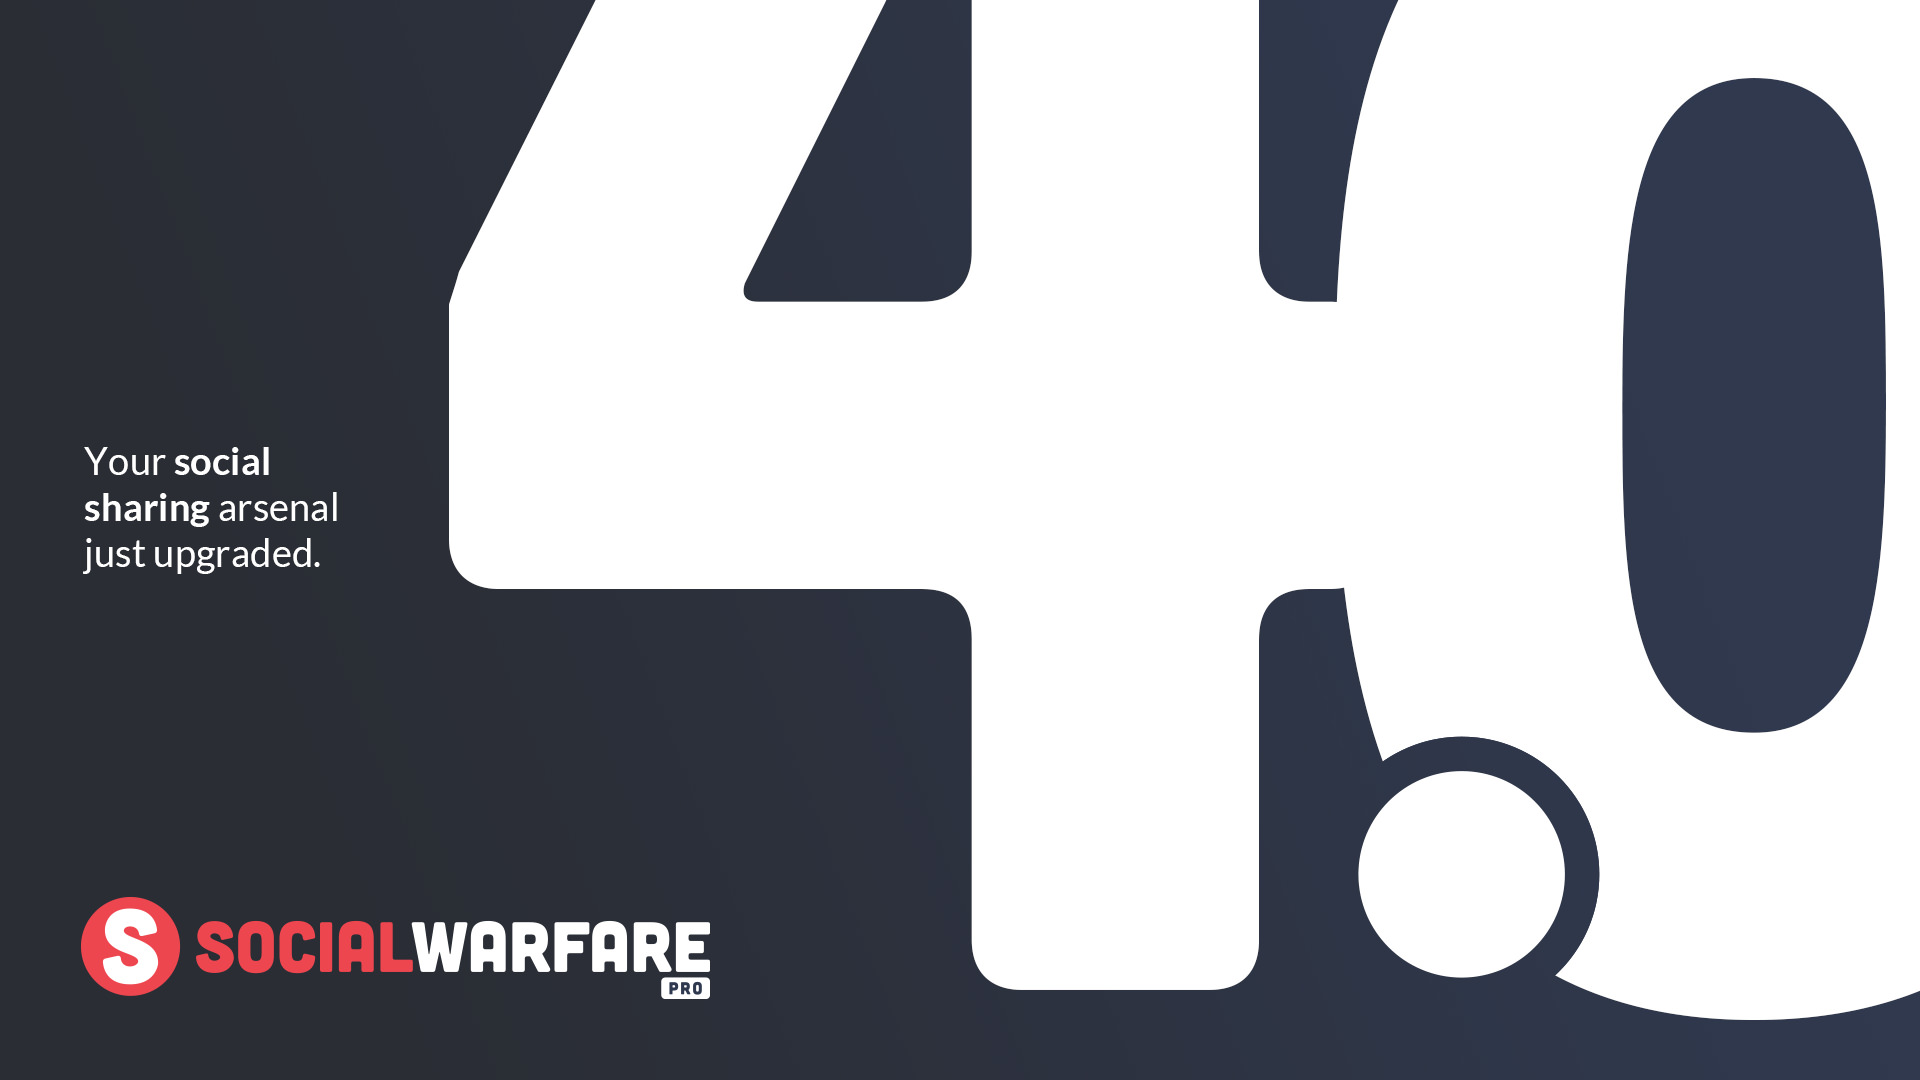 social warfare 4.0